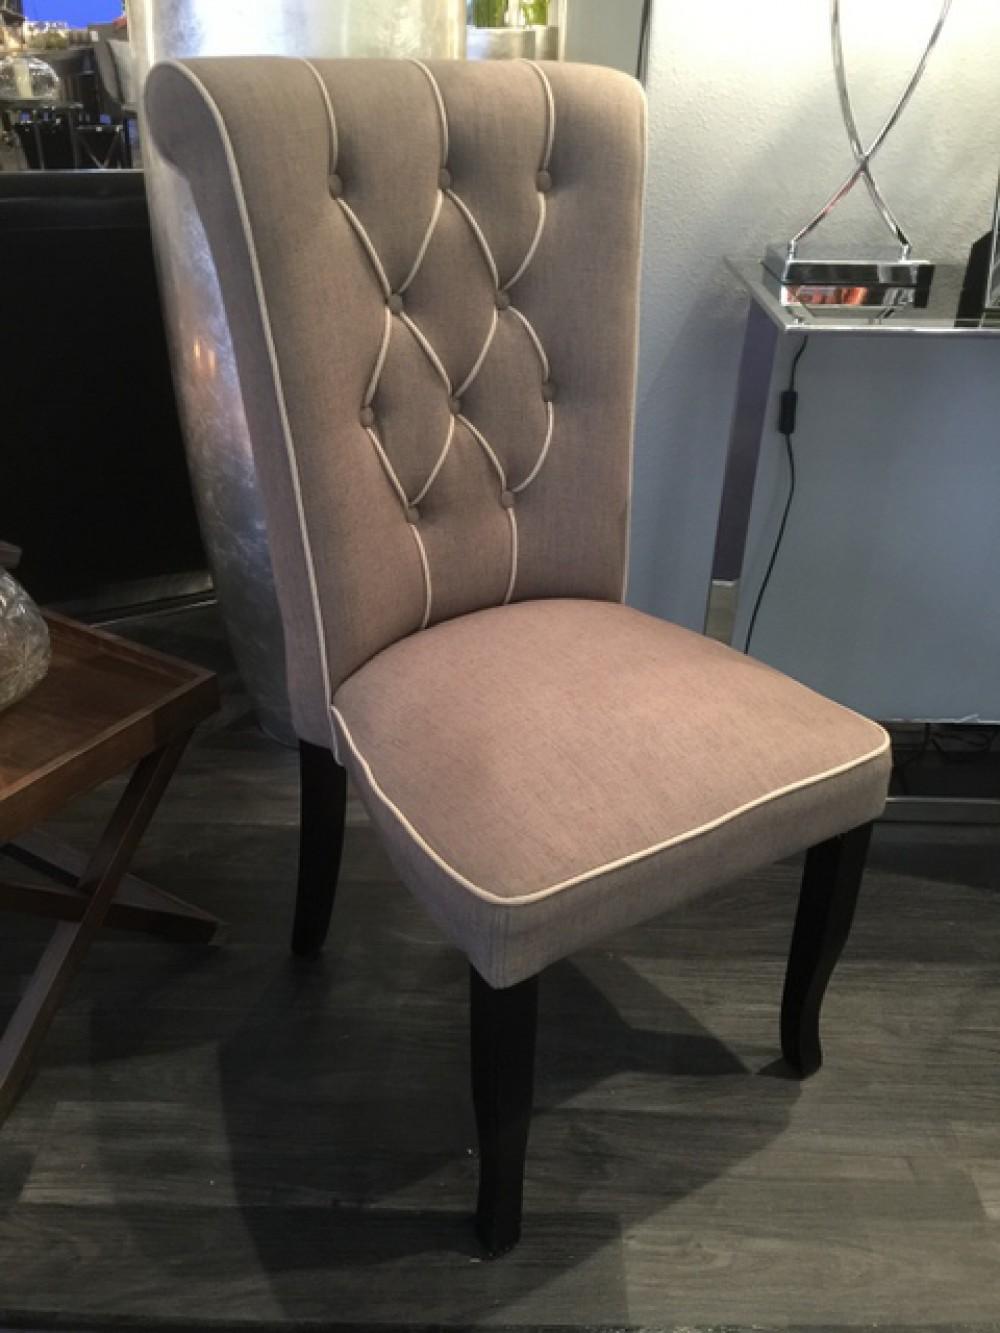 stuhl farbe leinen stuhl gepolstert landhaus. Black Bedroom Furniture Sets. Home Design Ideas